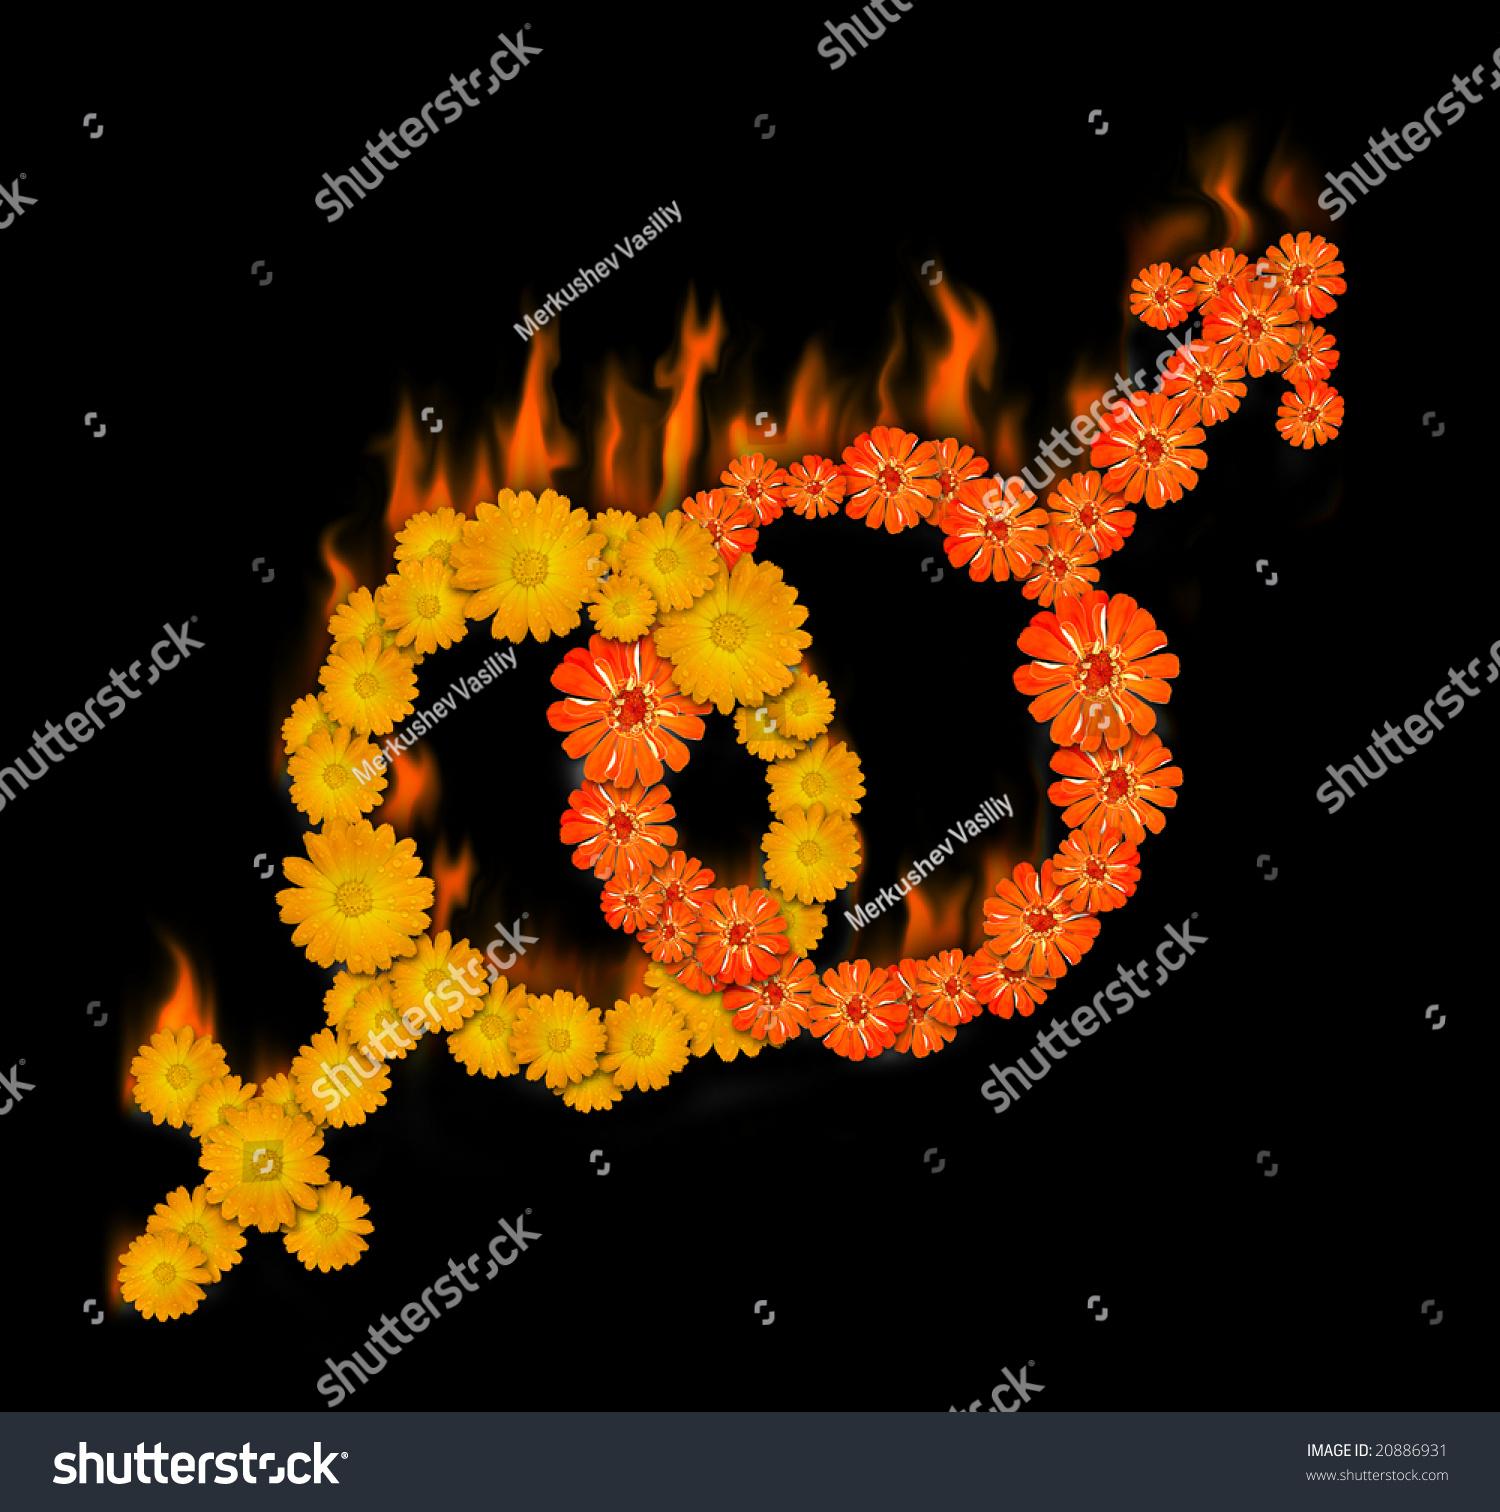 Male female sex symbols ablaze flowers stock illustration 20886931 male and female sex symbols ablaze flowers on black background biocorpaavc